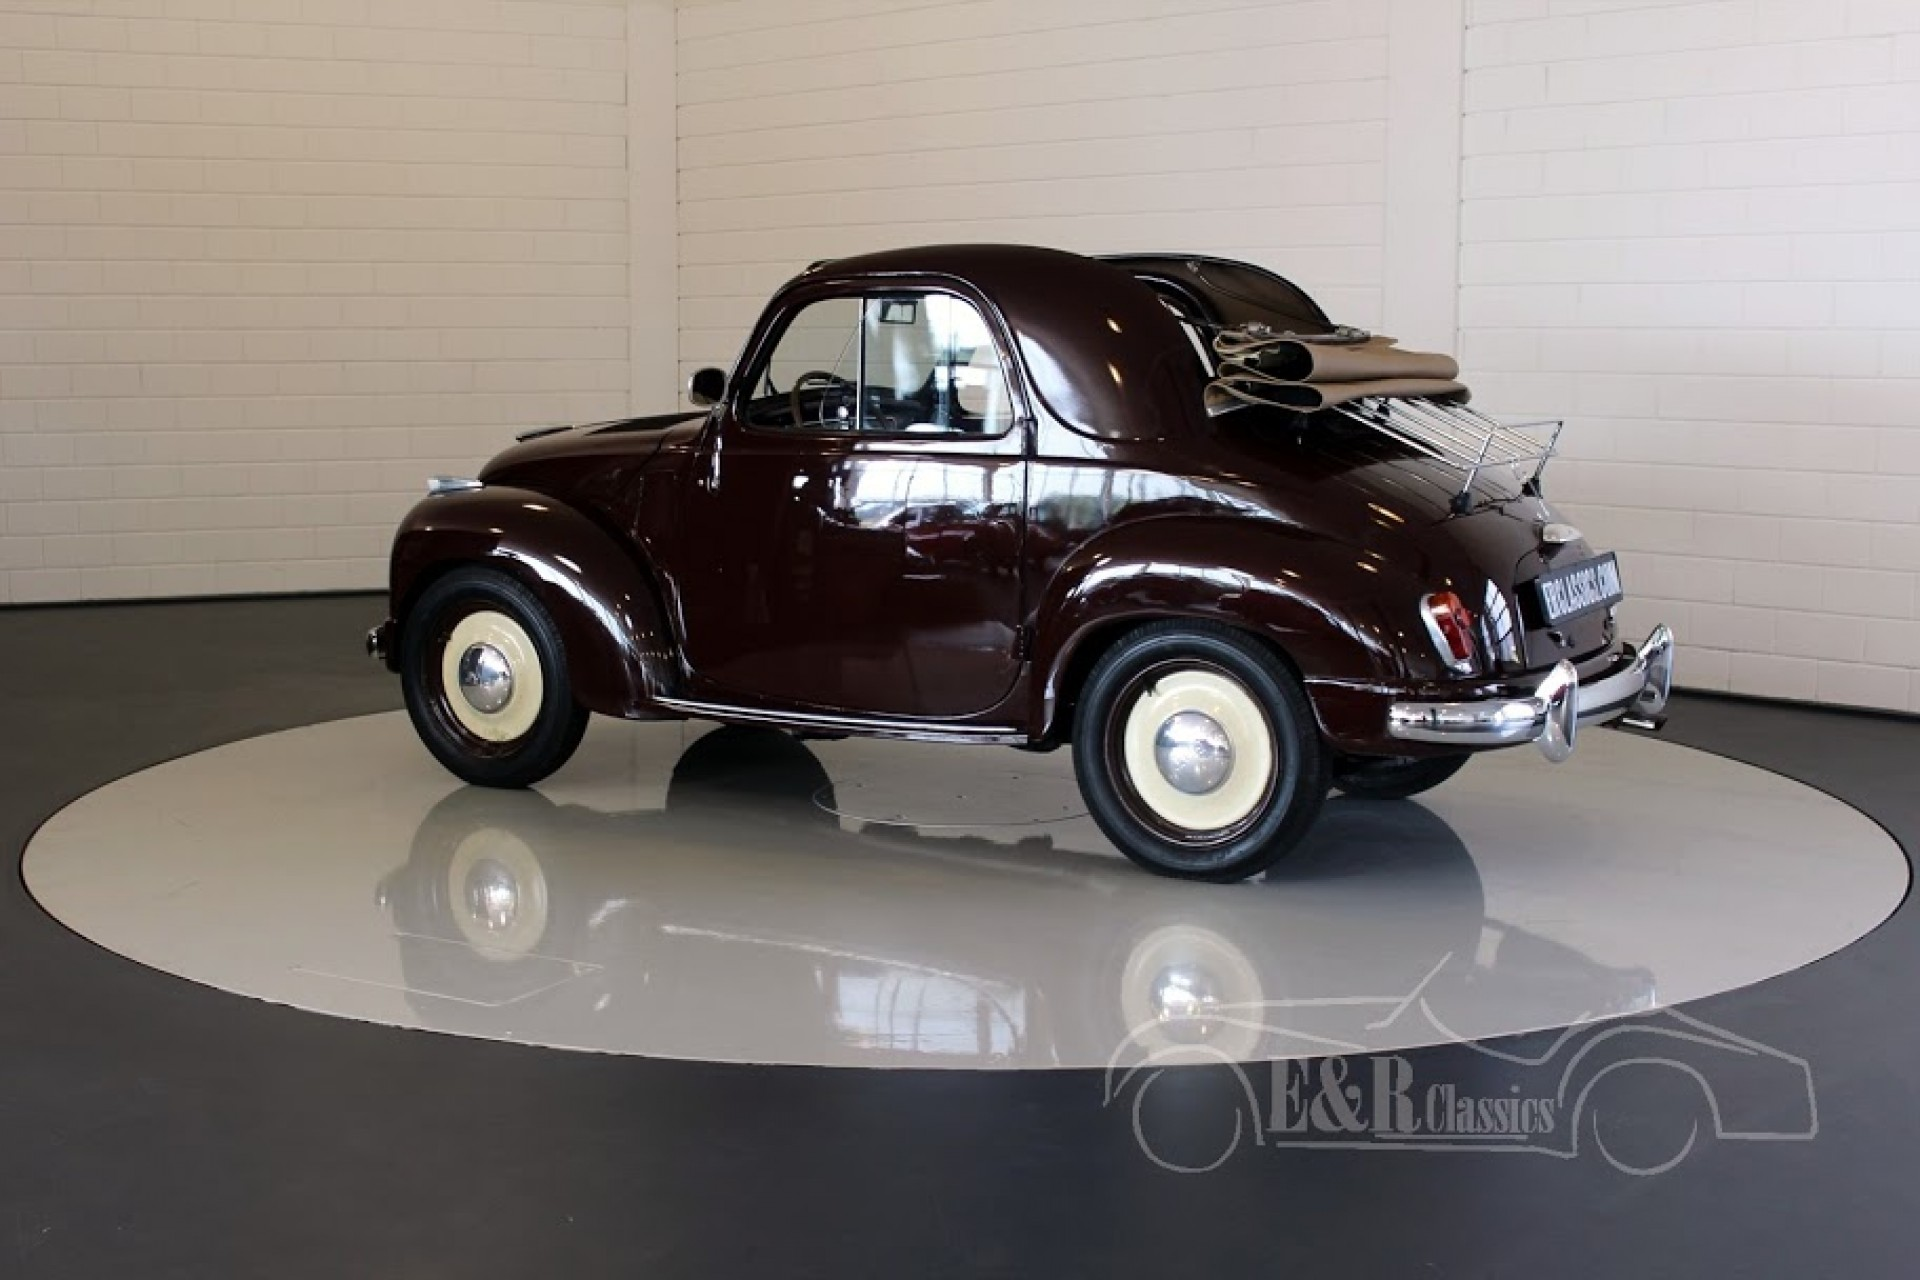 Fiat Topolino 500C Cabriolet 1950. View all photos ...